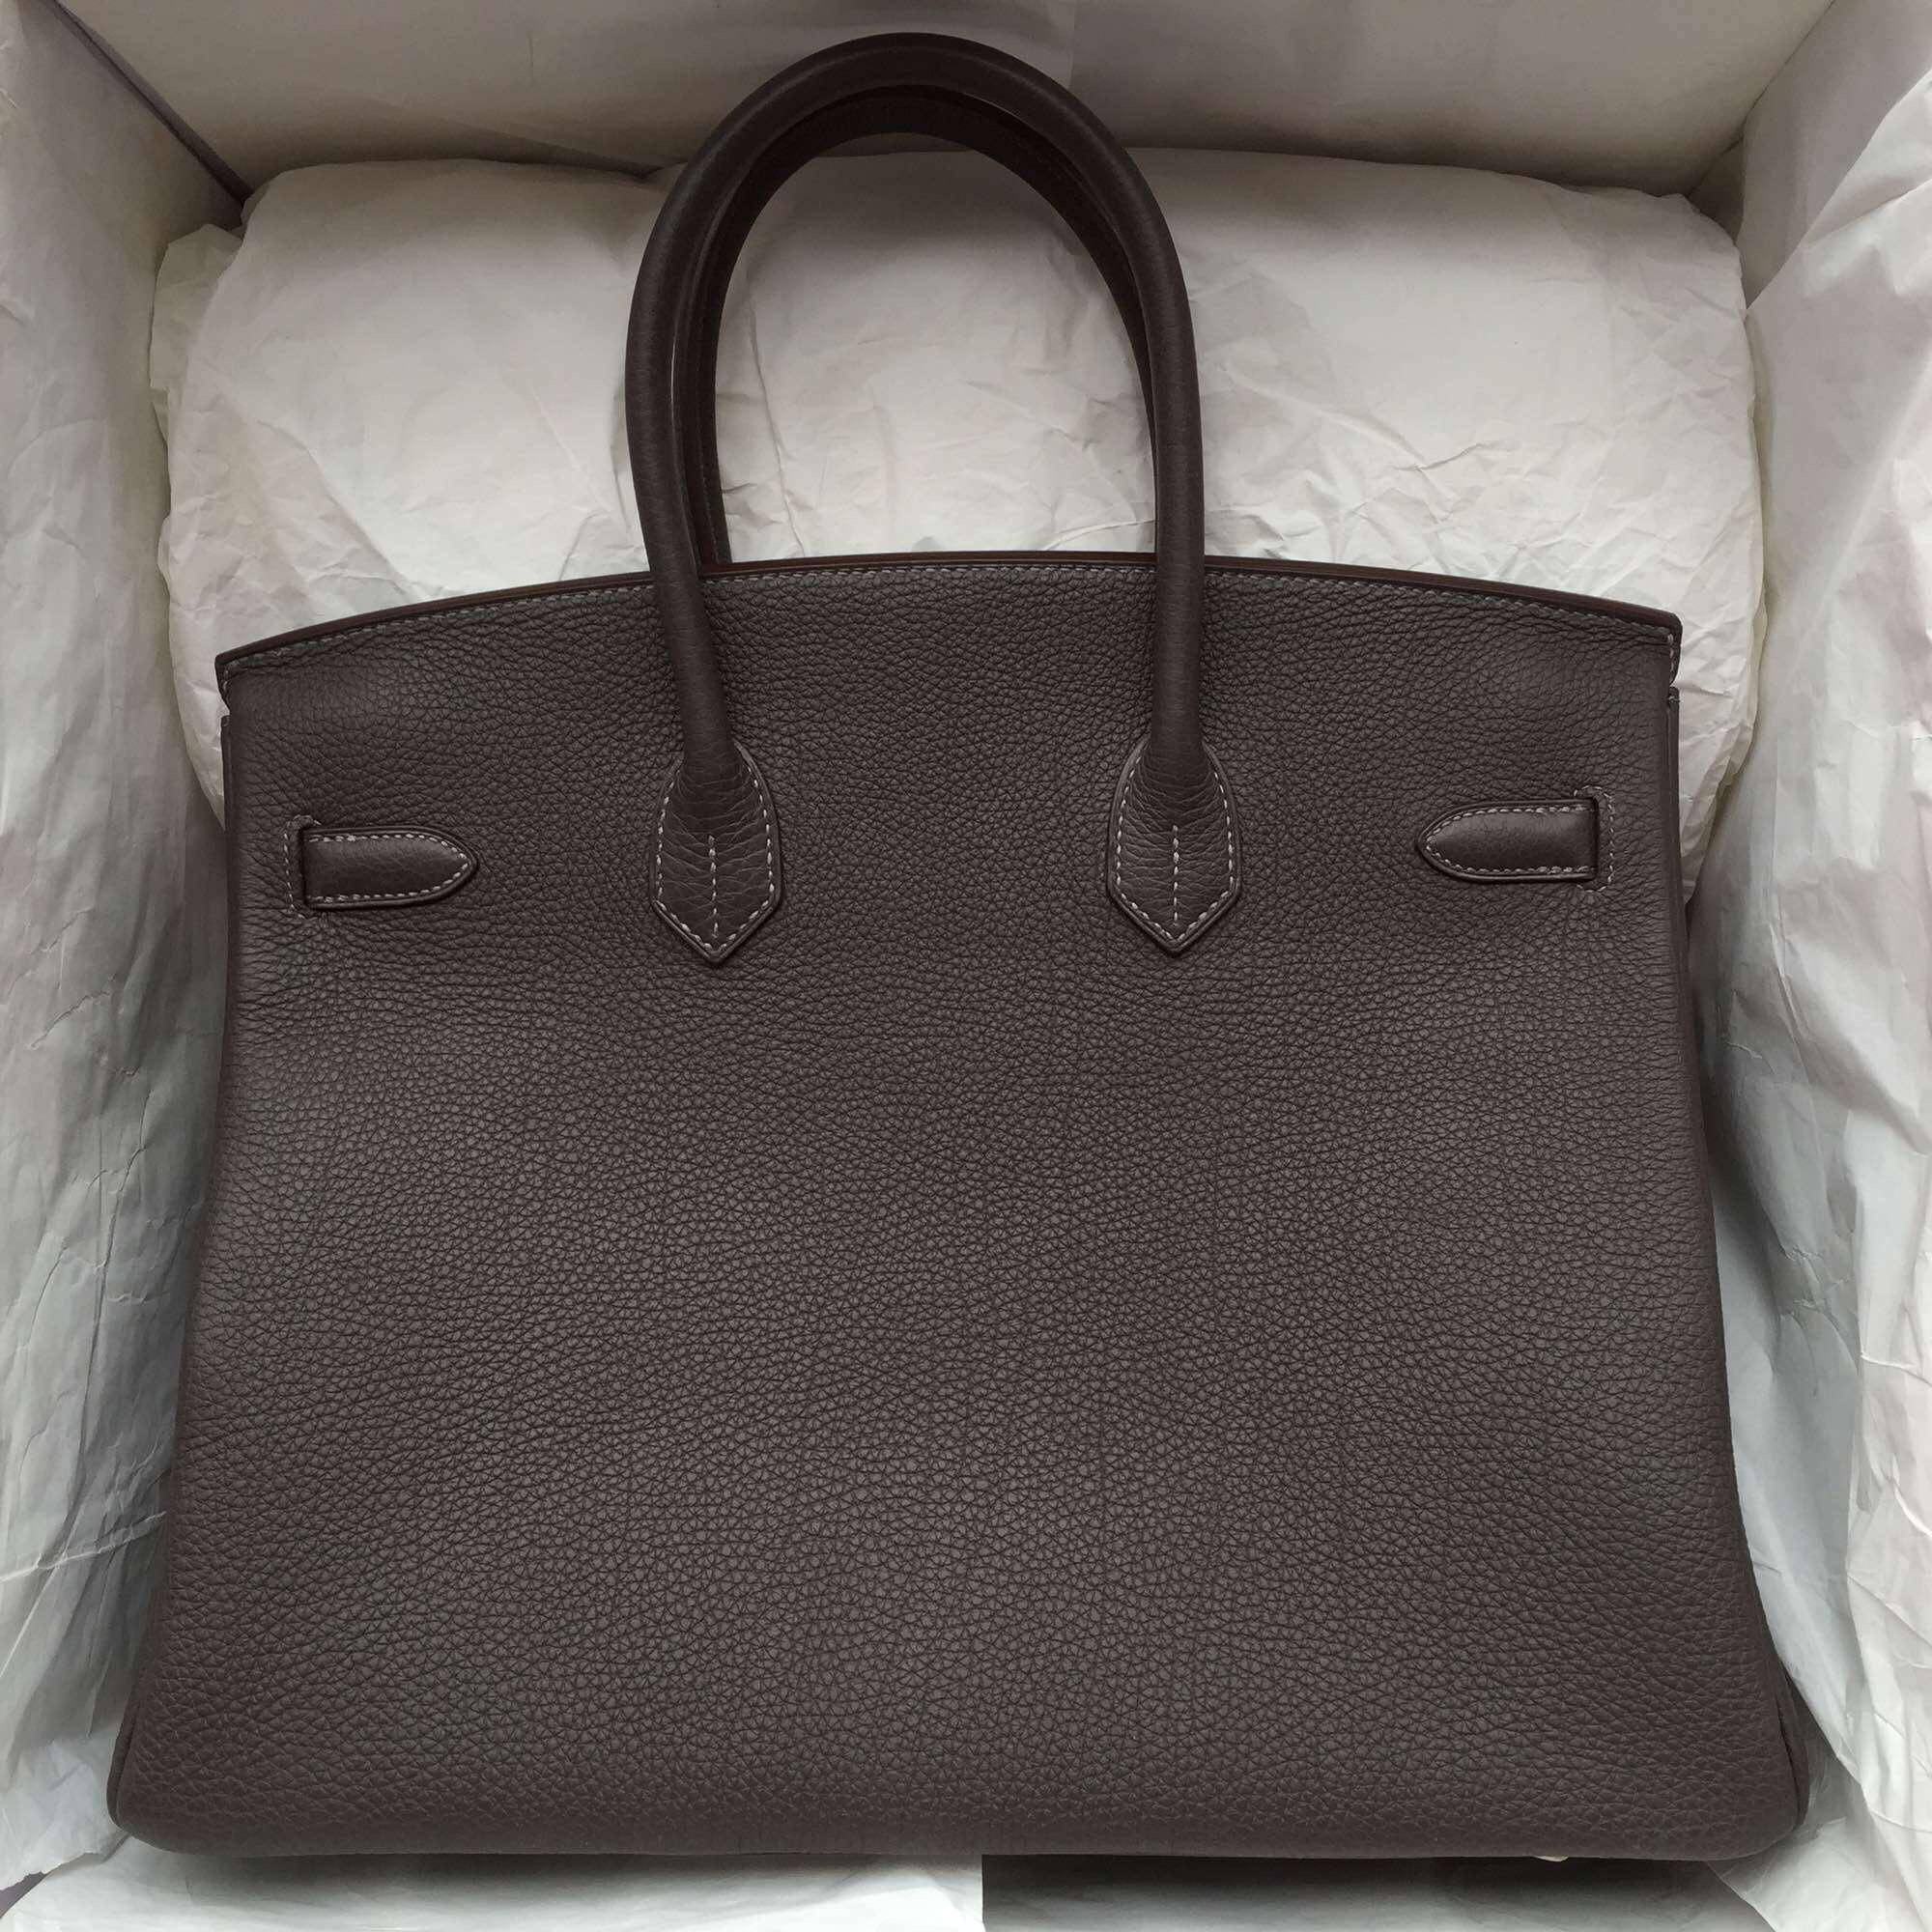 Pencil Grey Togo Leather Hermes Birkin35 Silver Hardware Fashion Tote Bag